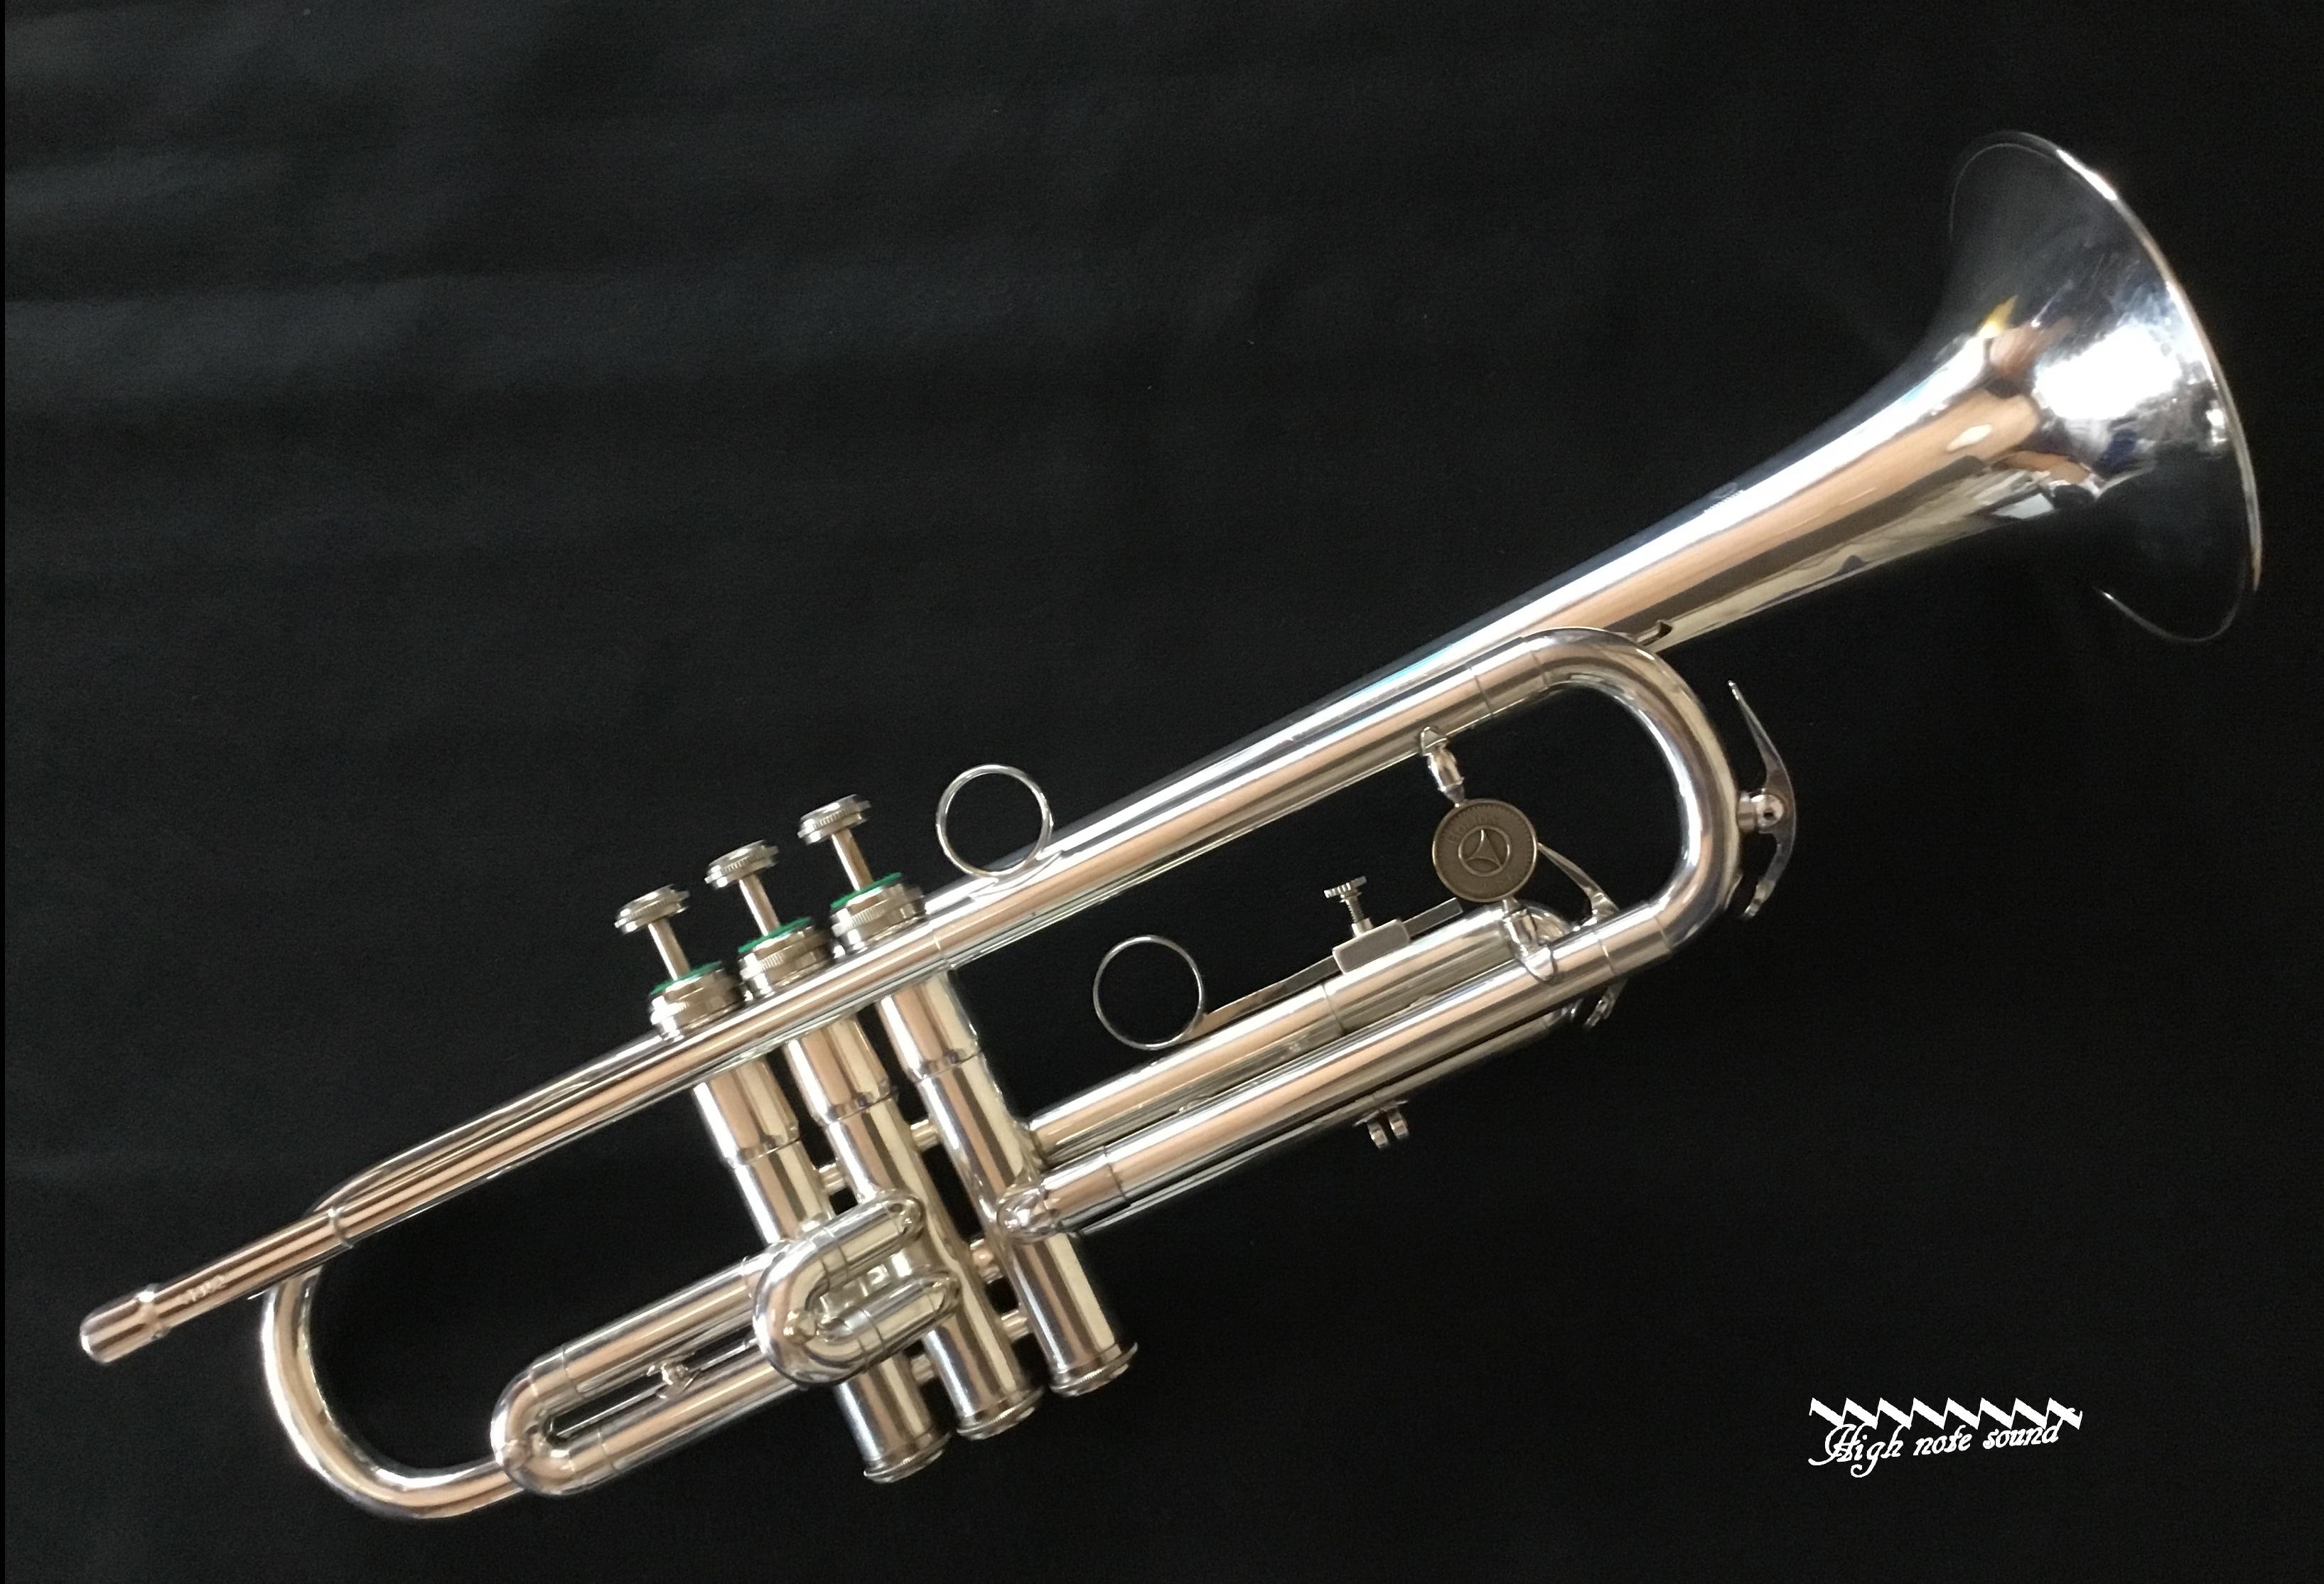 ST-302 001